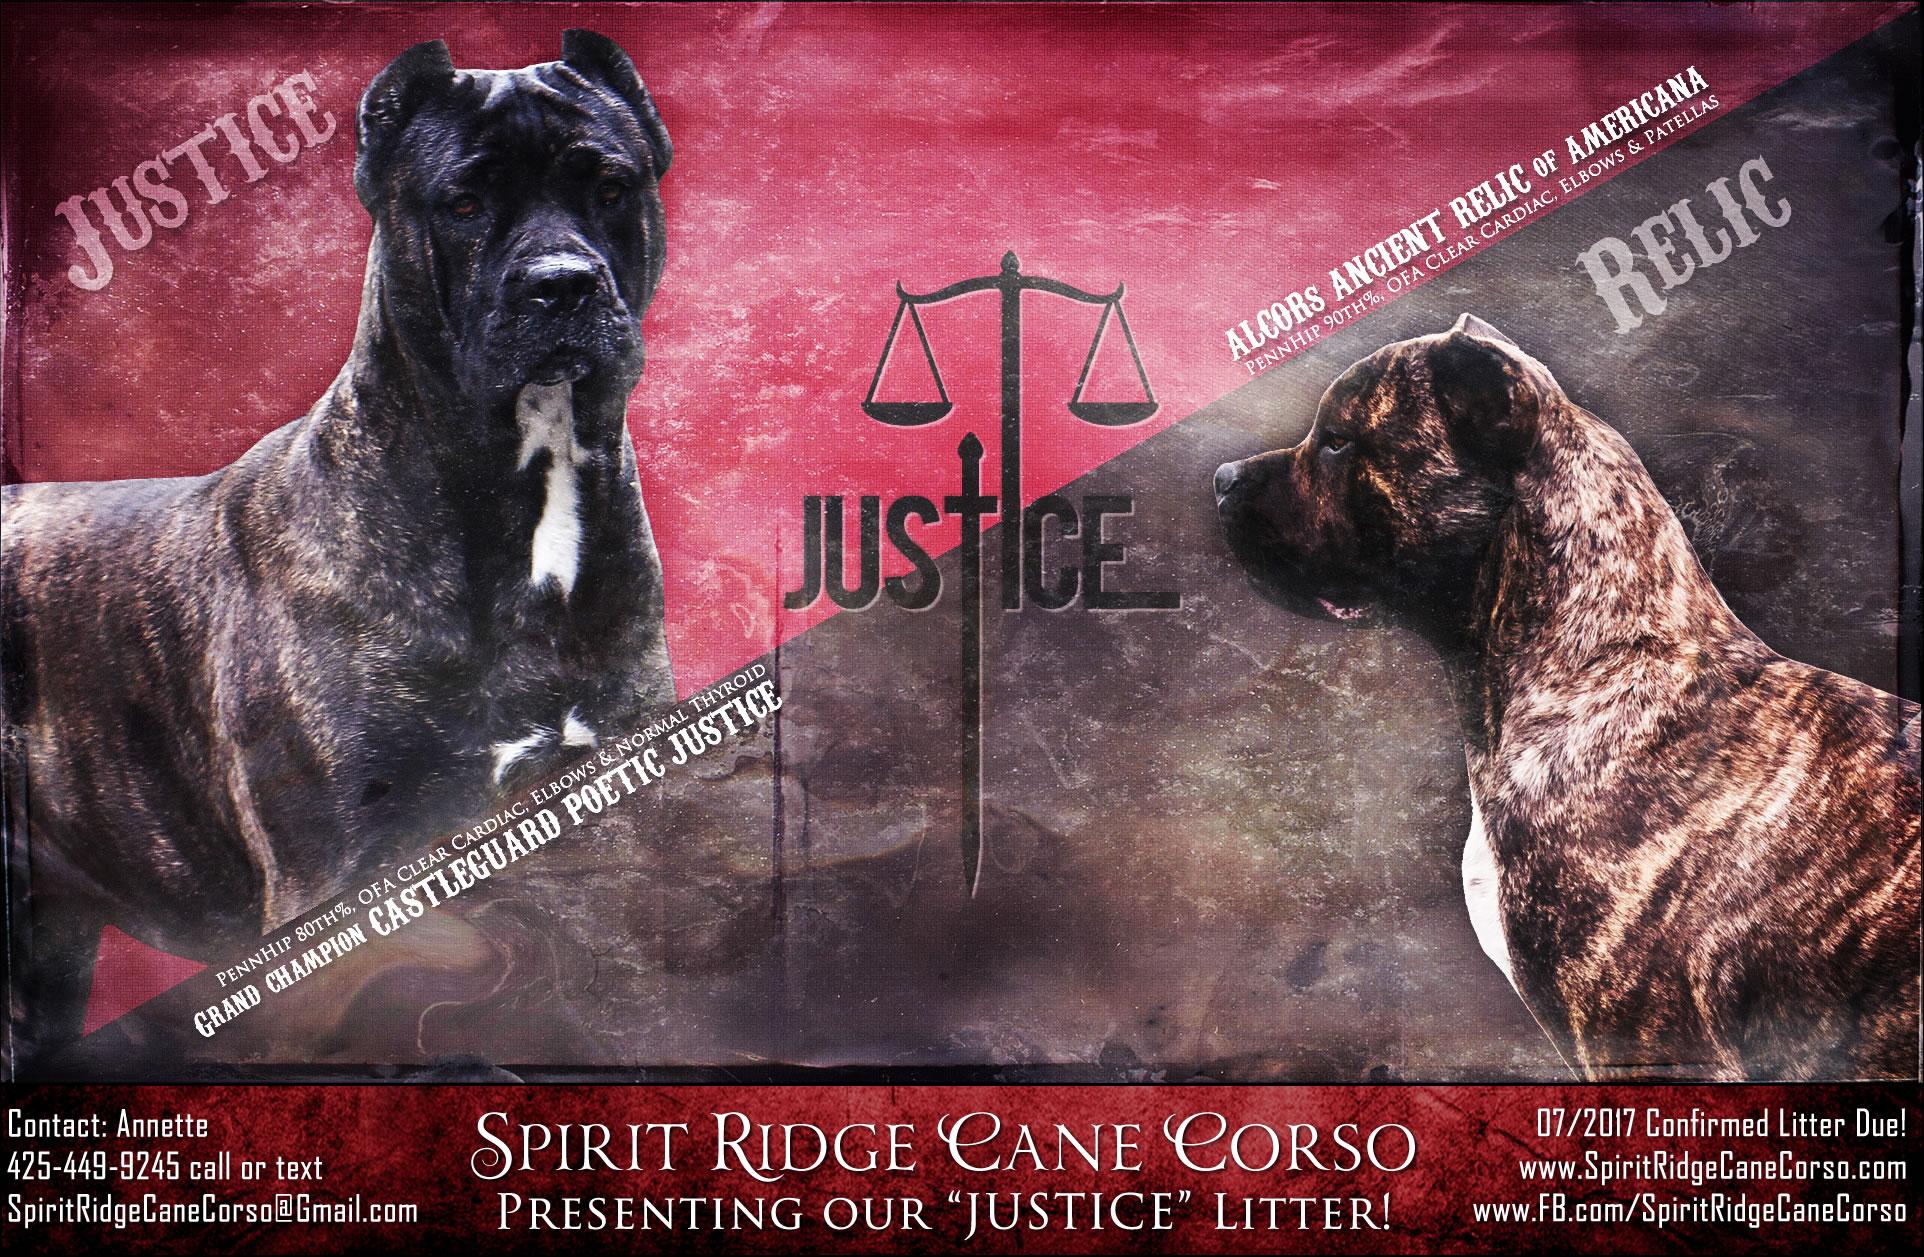 Spirit Ridge Cane Corso